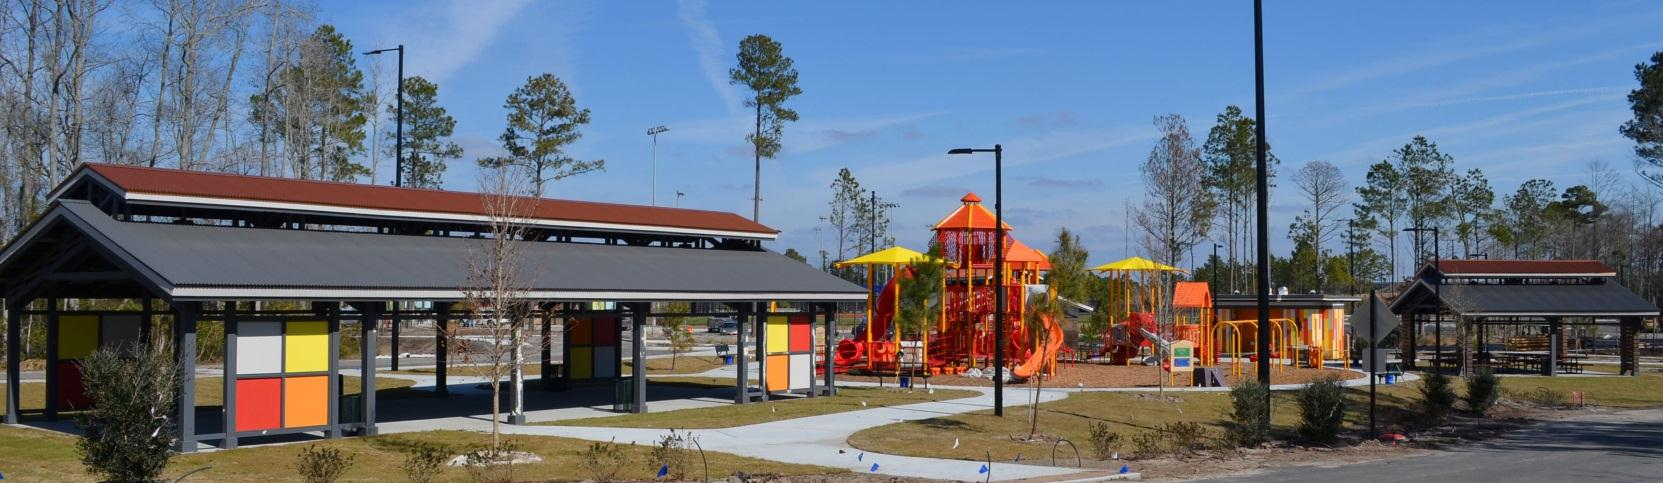 Sports Complex - Playground Area